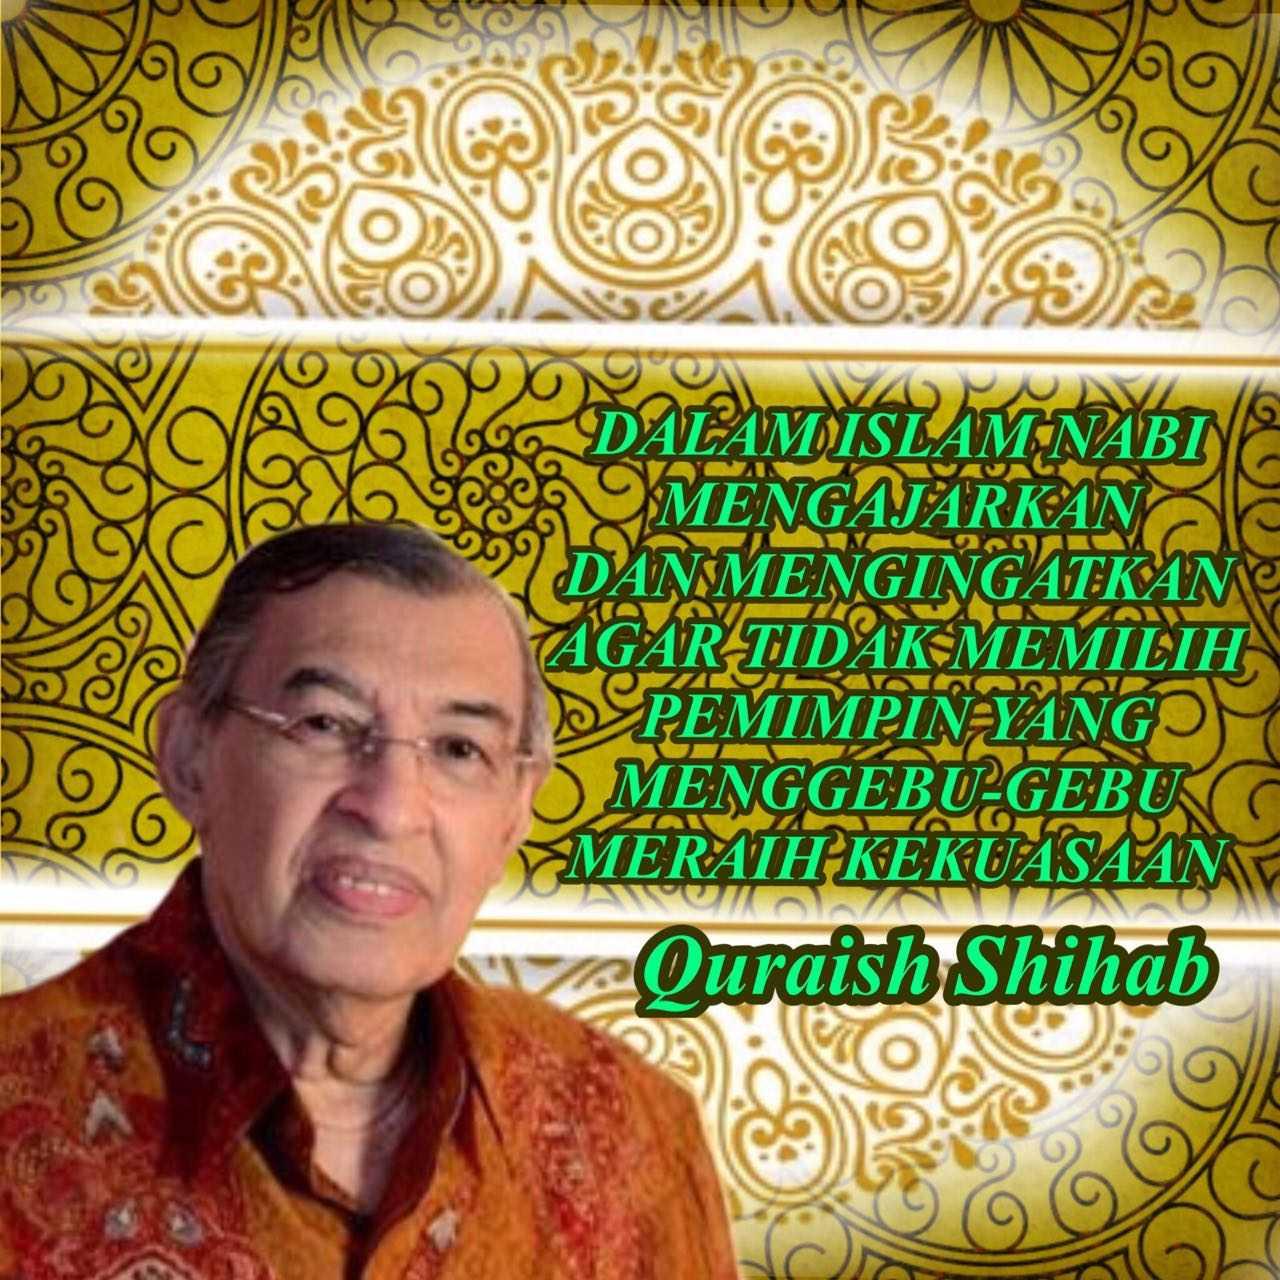 Quraish Shihab Jangan Pilih Pemimpin Yang Menggebu Gebu Ingin